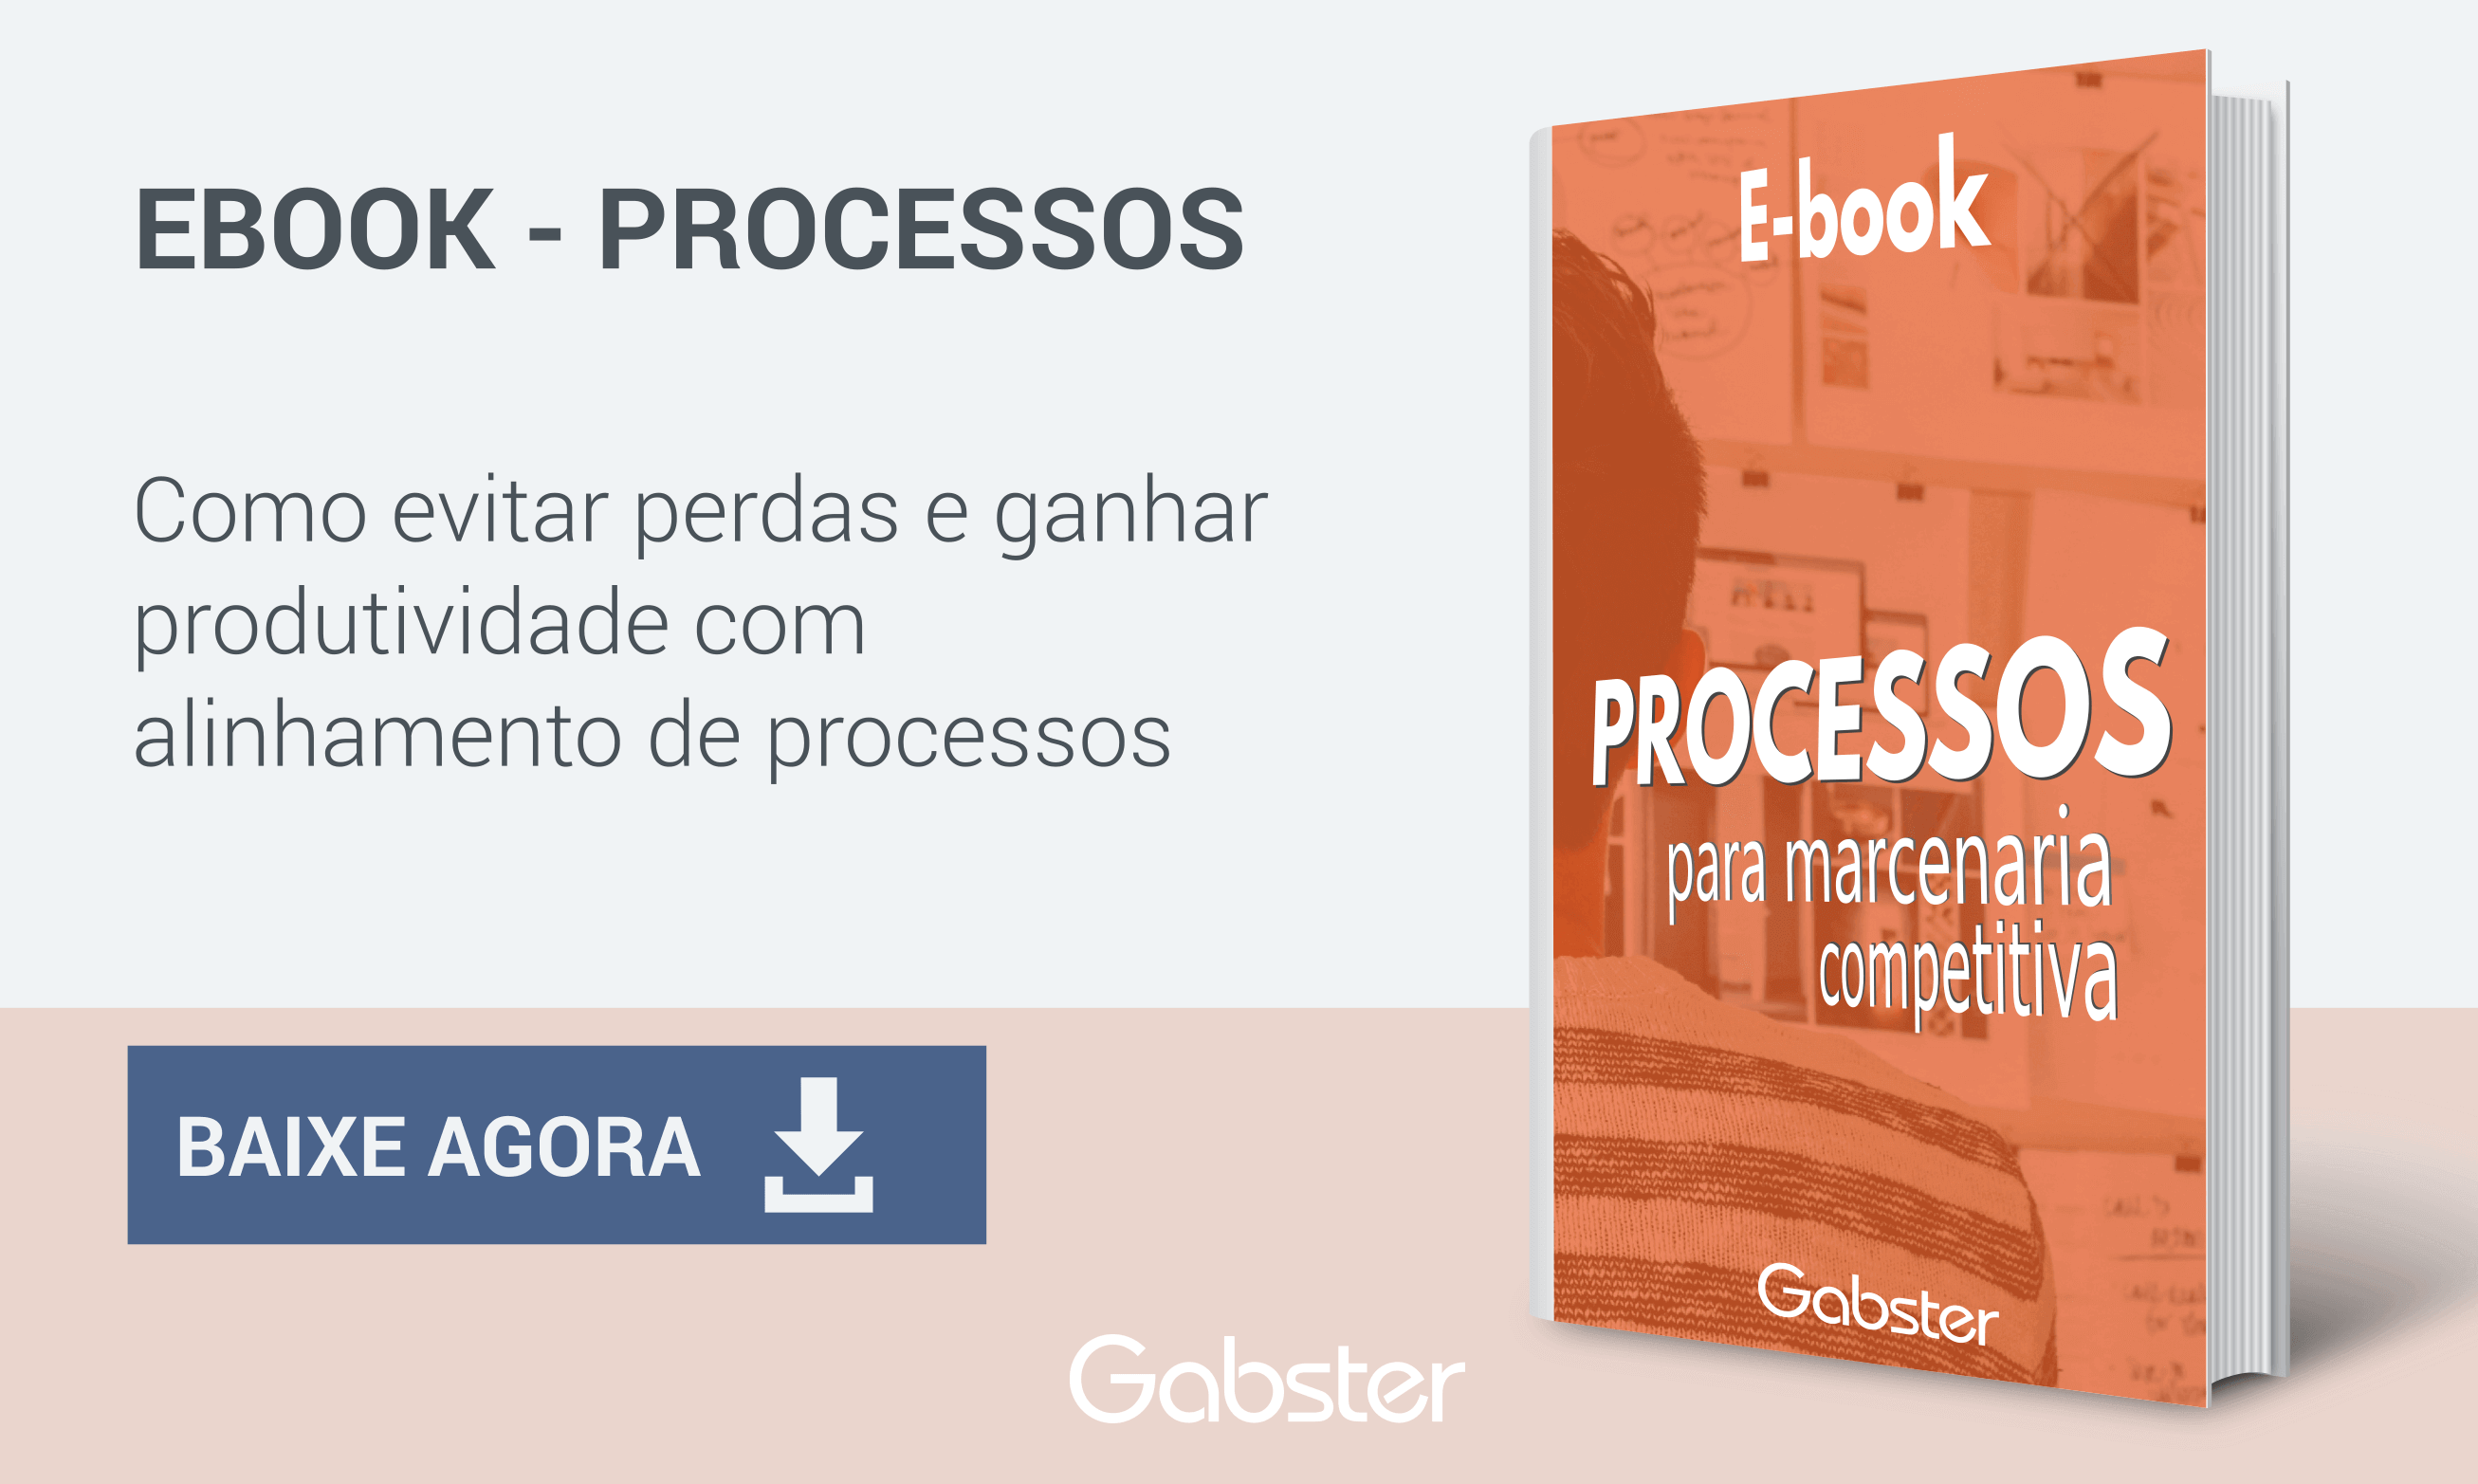 Ebook: Processos